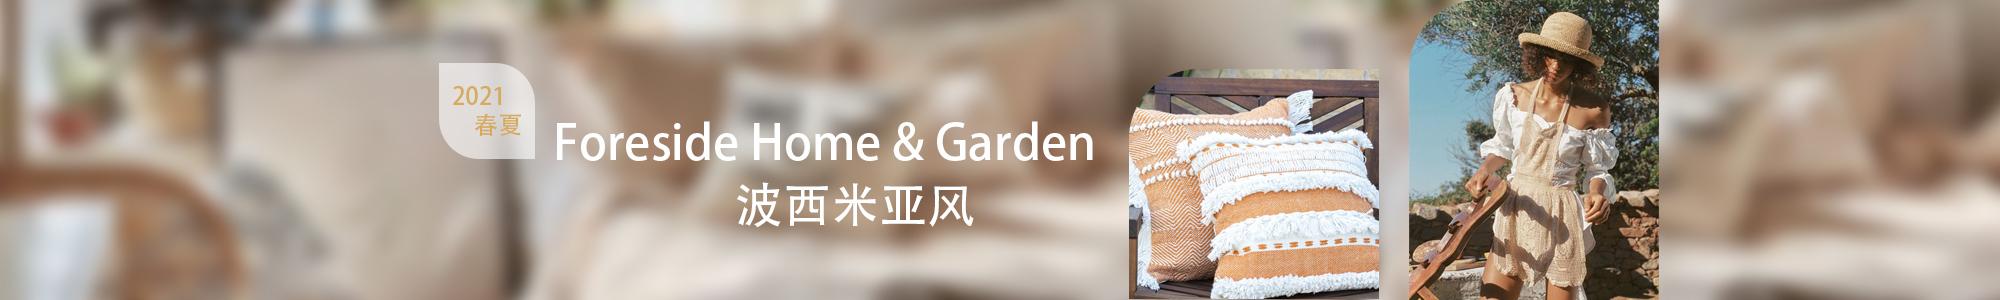 Foreside Home & Garden  波西米亚风